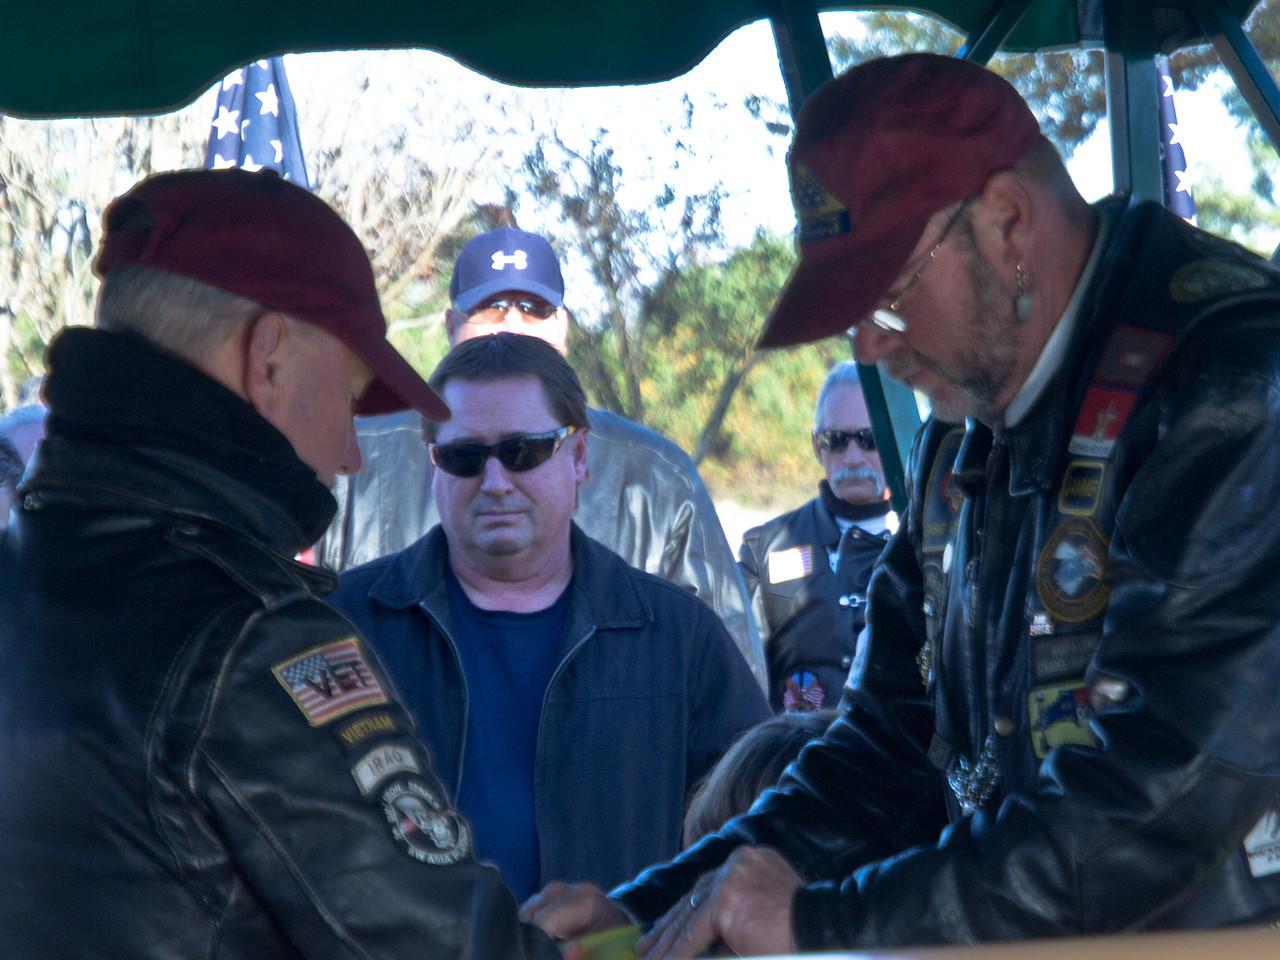 OB Jammer helps prepare a PGR flag